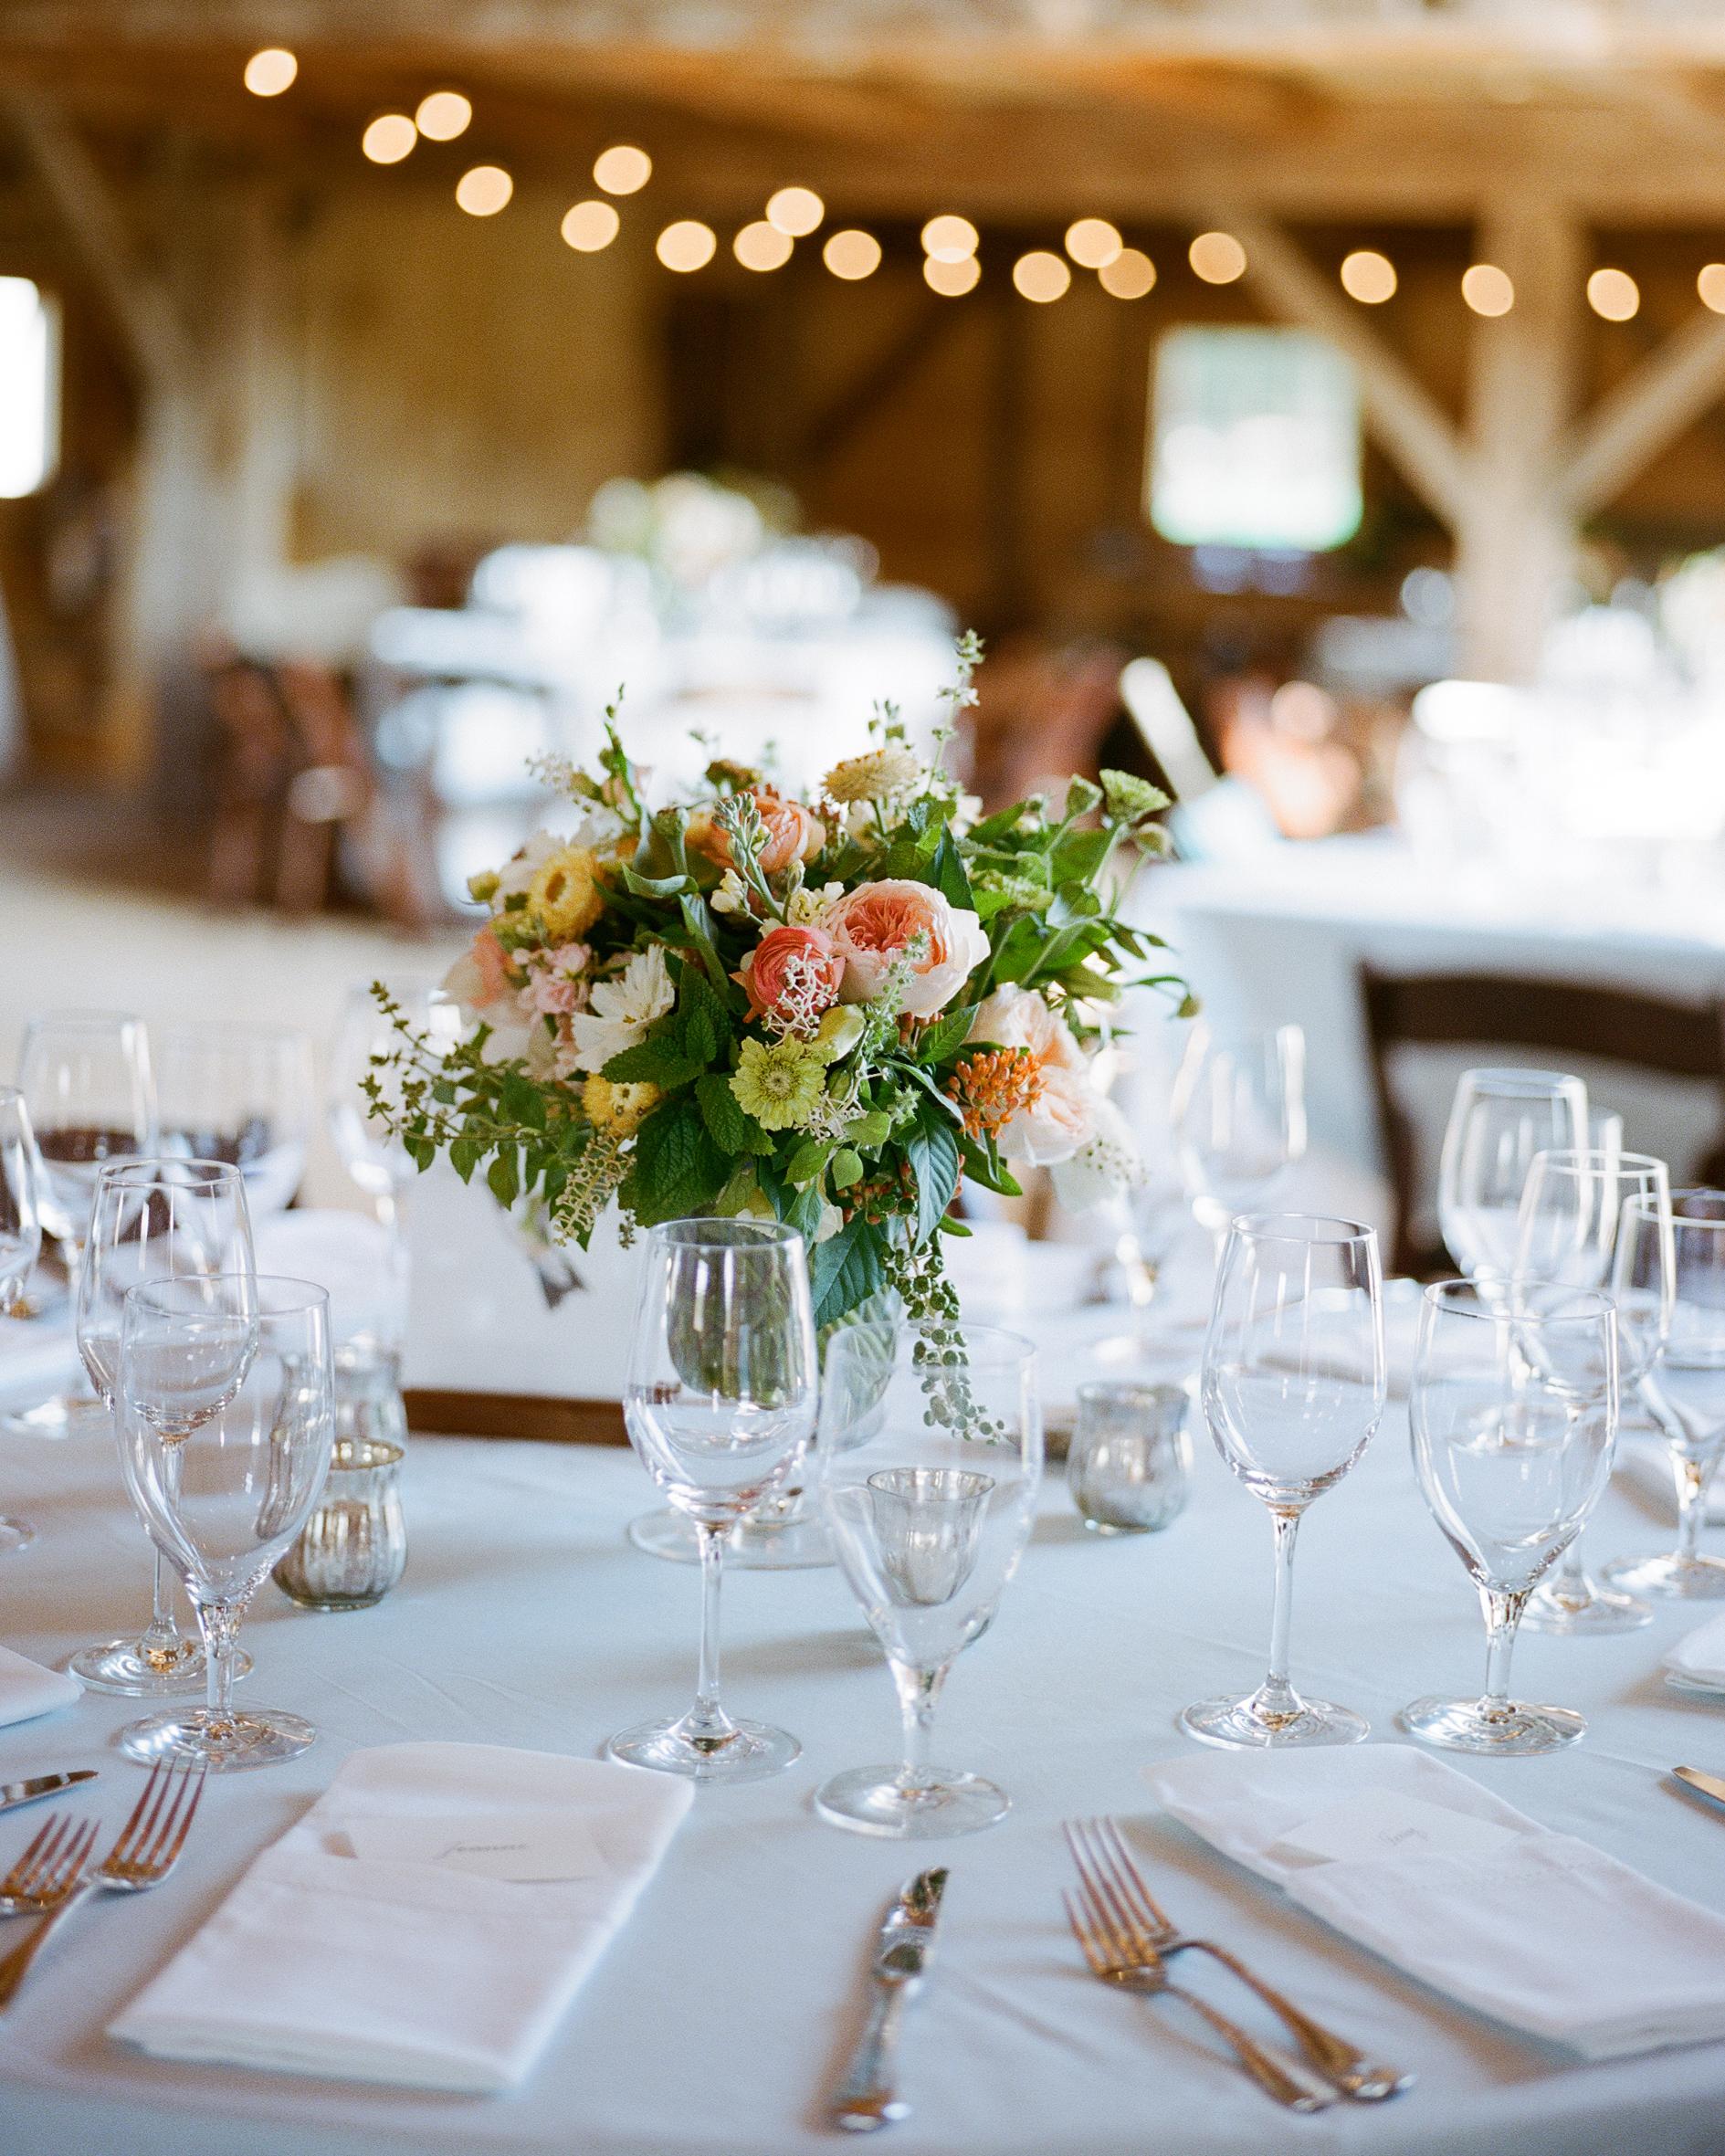 jocelyn-graham-wedding-centerpiece-1108-s111847-0315.jpg